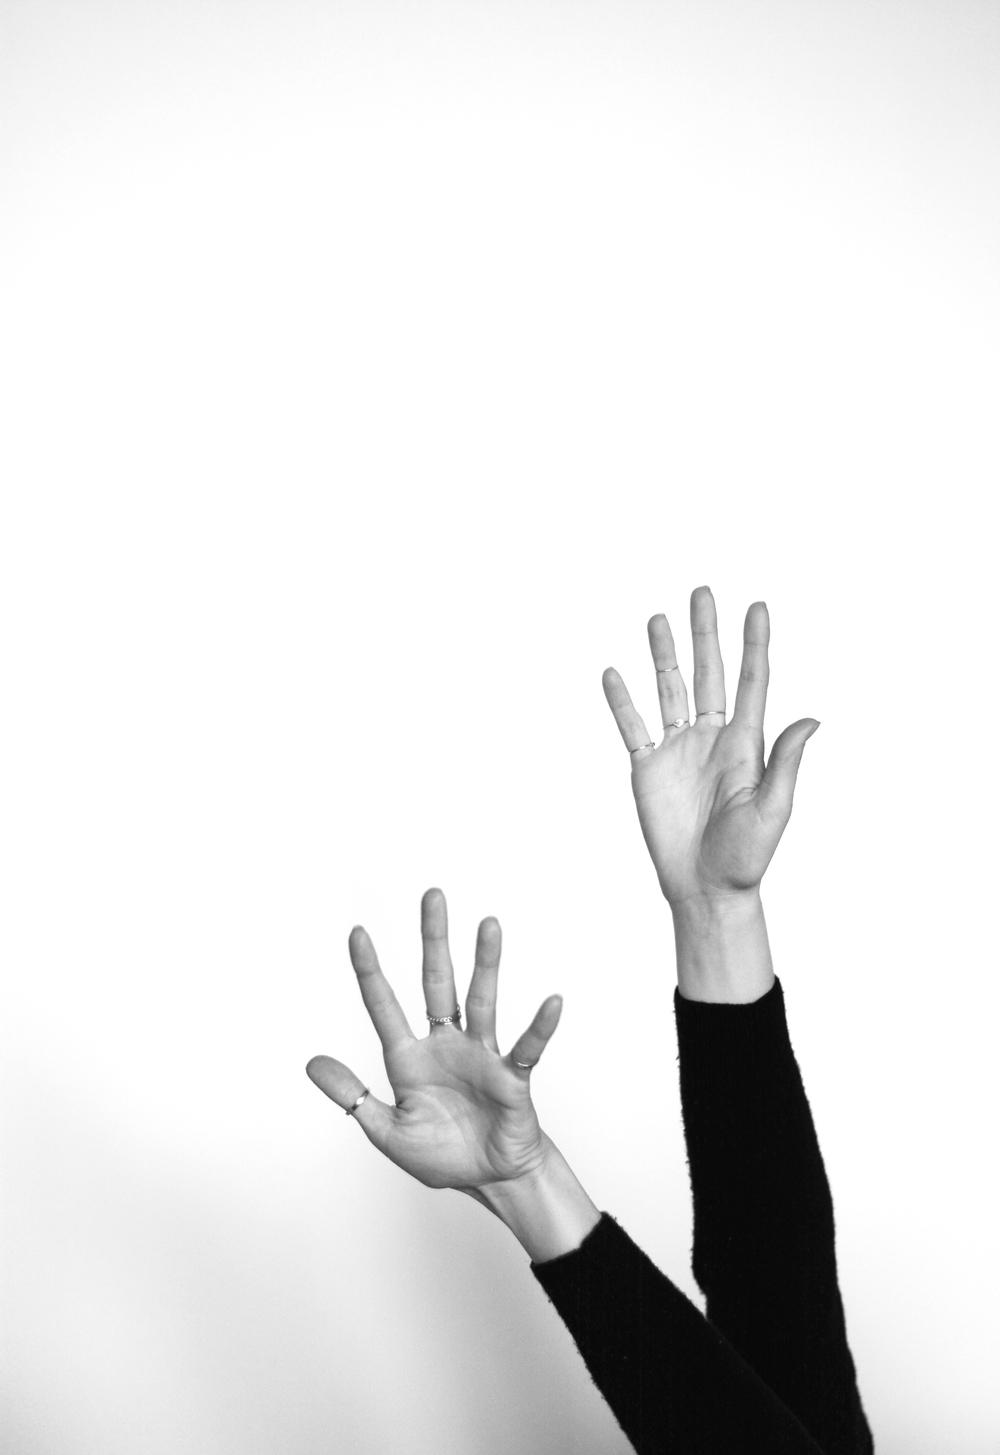 TaylrAnne-The-Sept-Cashmere-Minimal-11